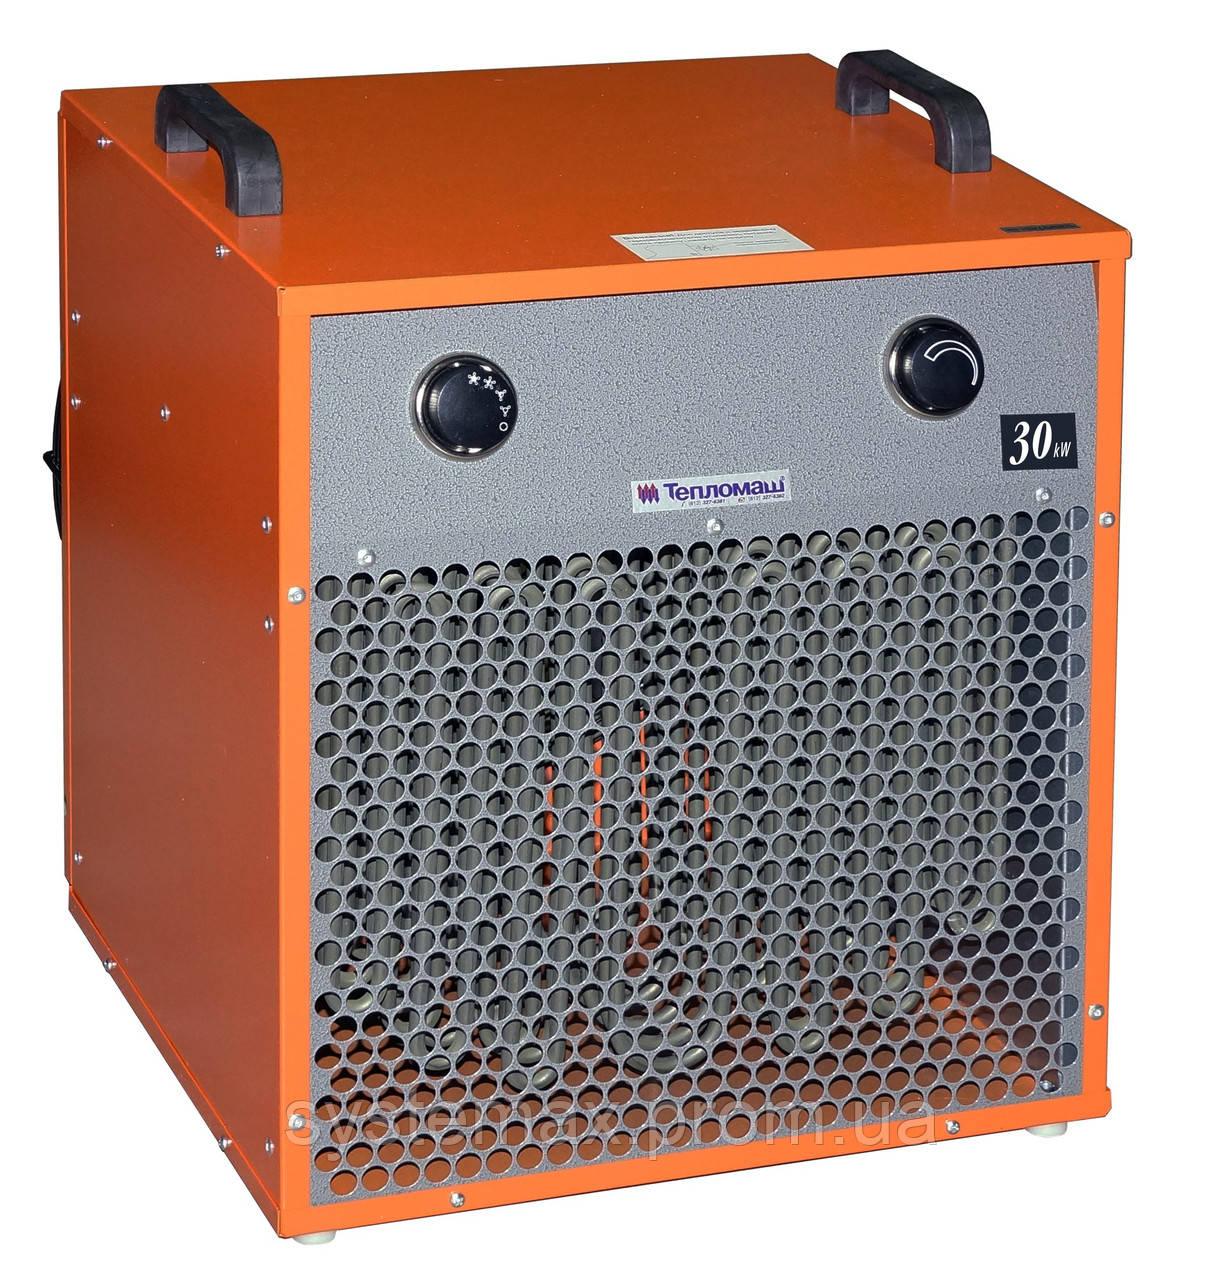 Тепломаш КЭВ-30Т20Е (КЭВ 30Т20Е) 30 кВт - тепловентилятор (тепловая пушка)